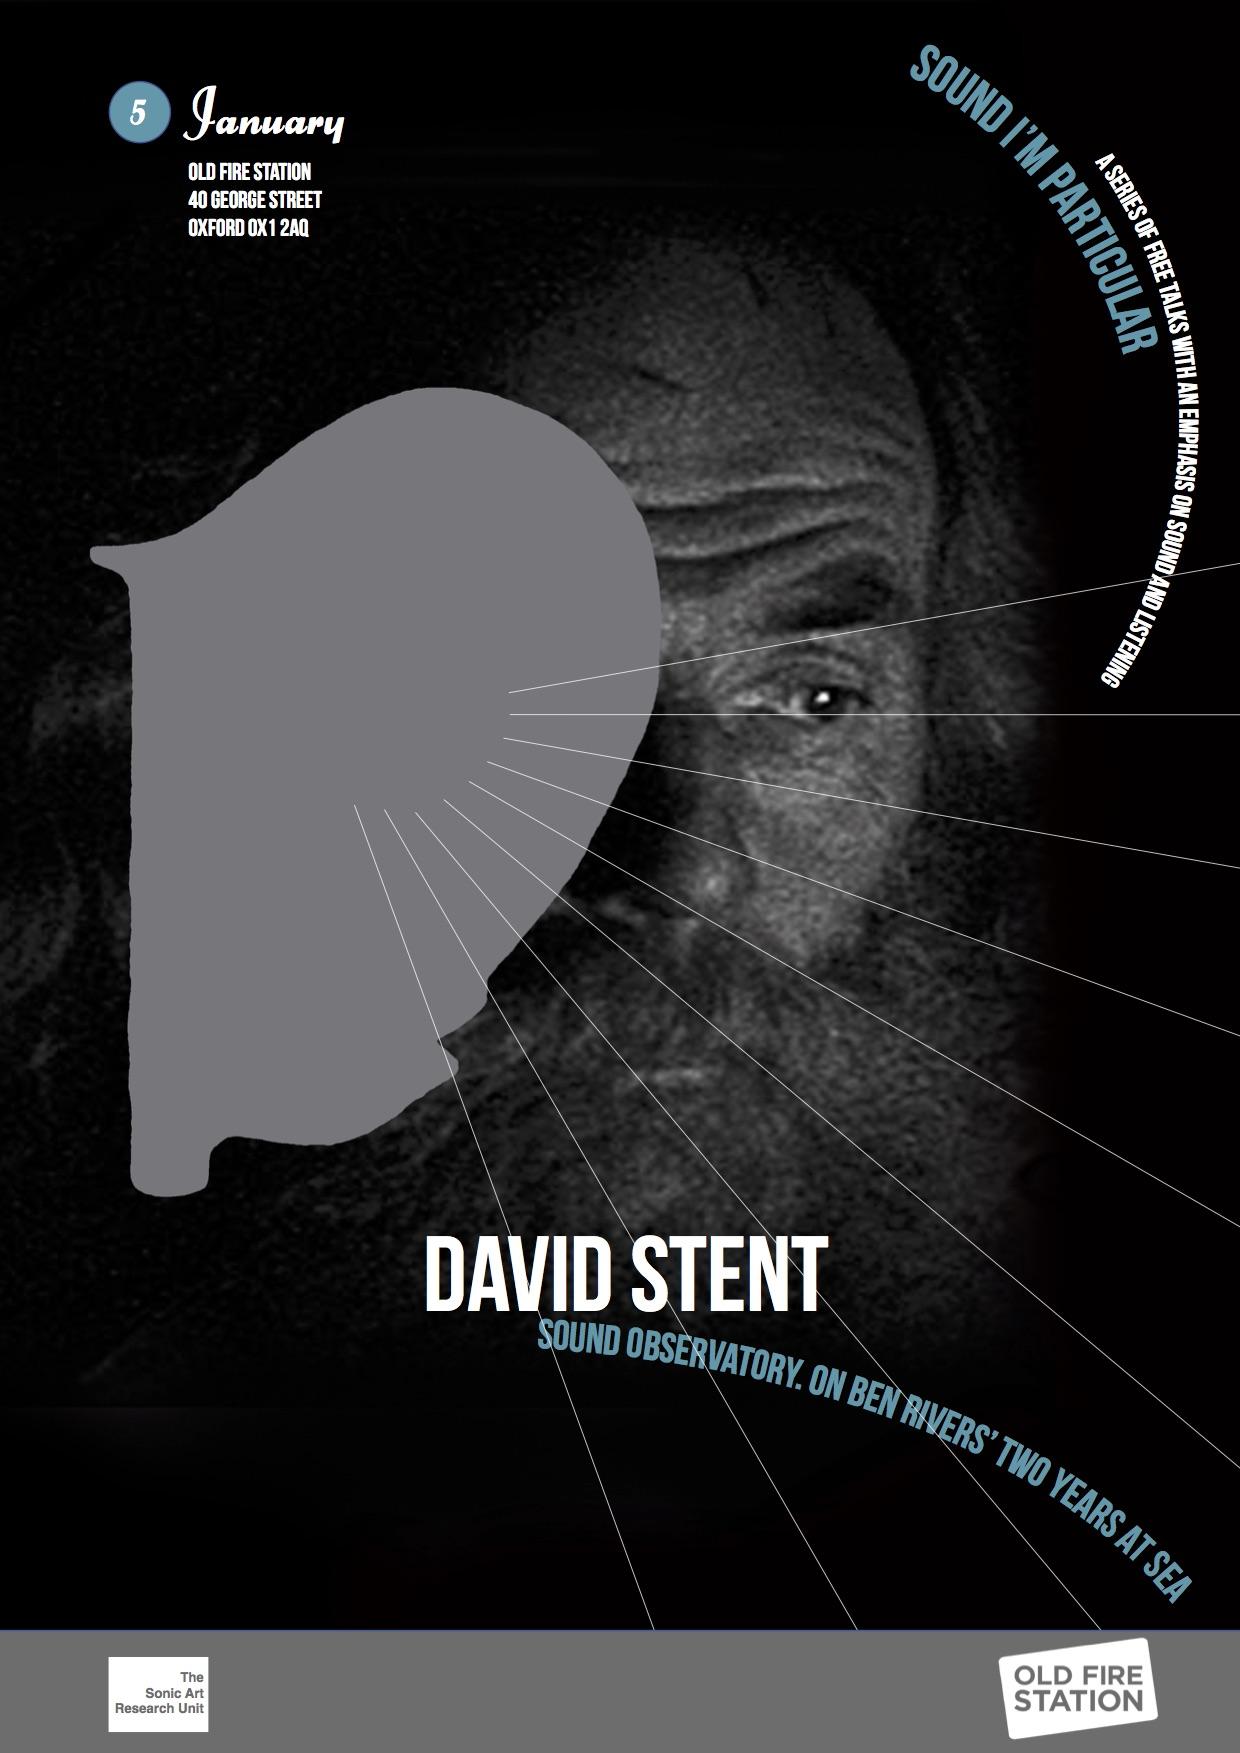 Sound I'm Particular 4. David Stent, Sound Observatory.